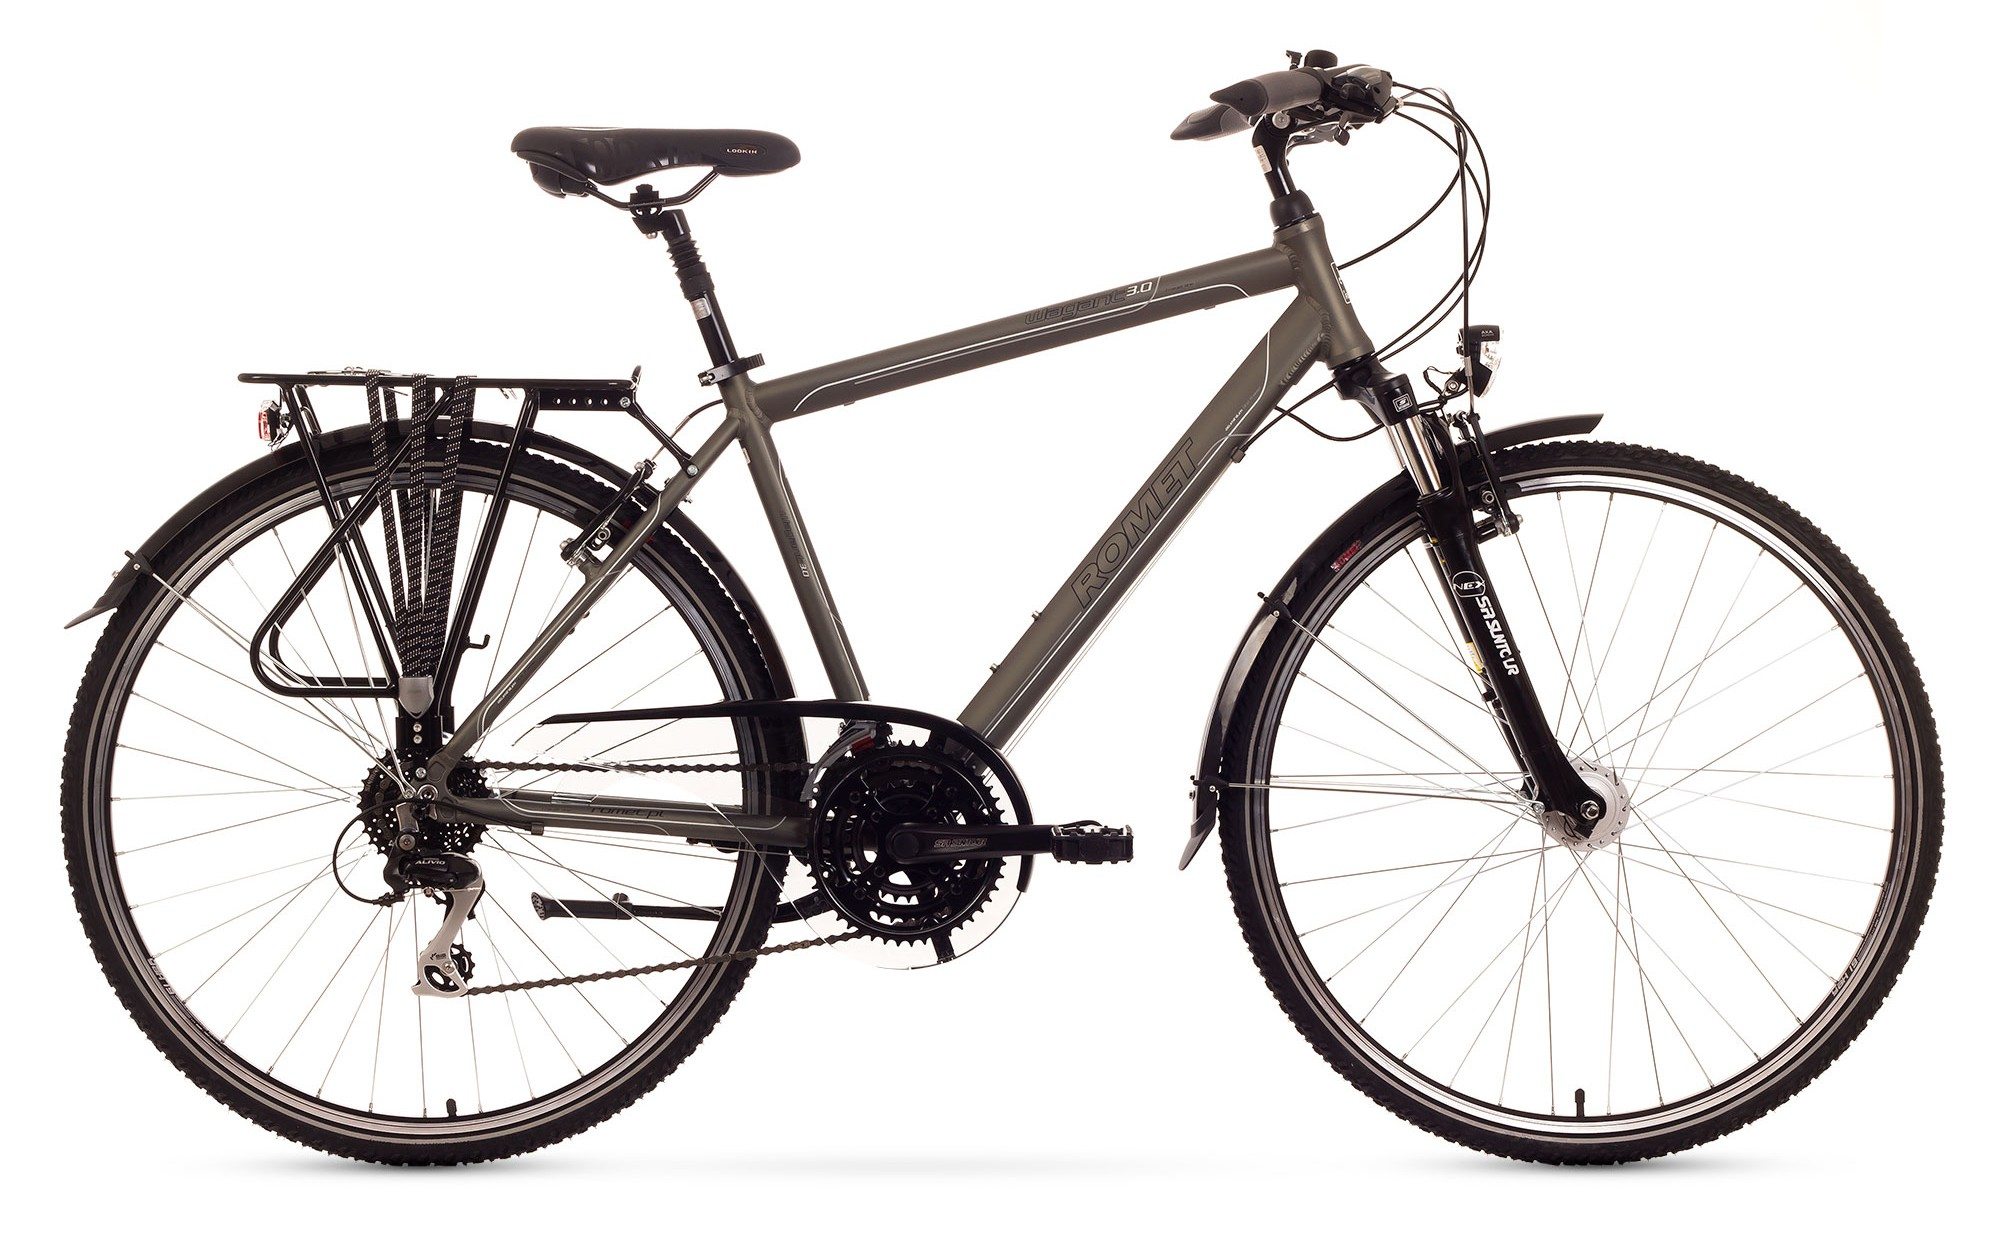 Bicicleta Trekking Romet Wagant 3.0 - grafit